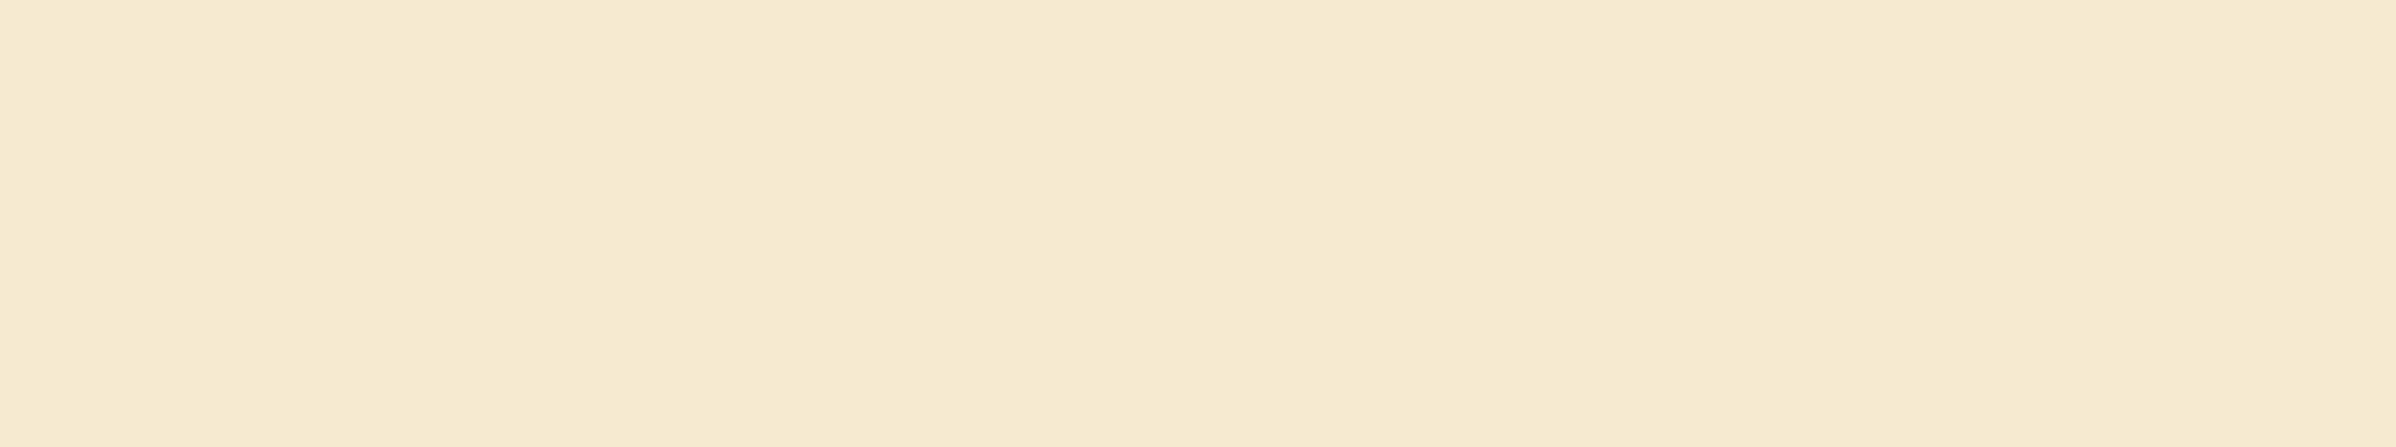 #24 @ 1% - White